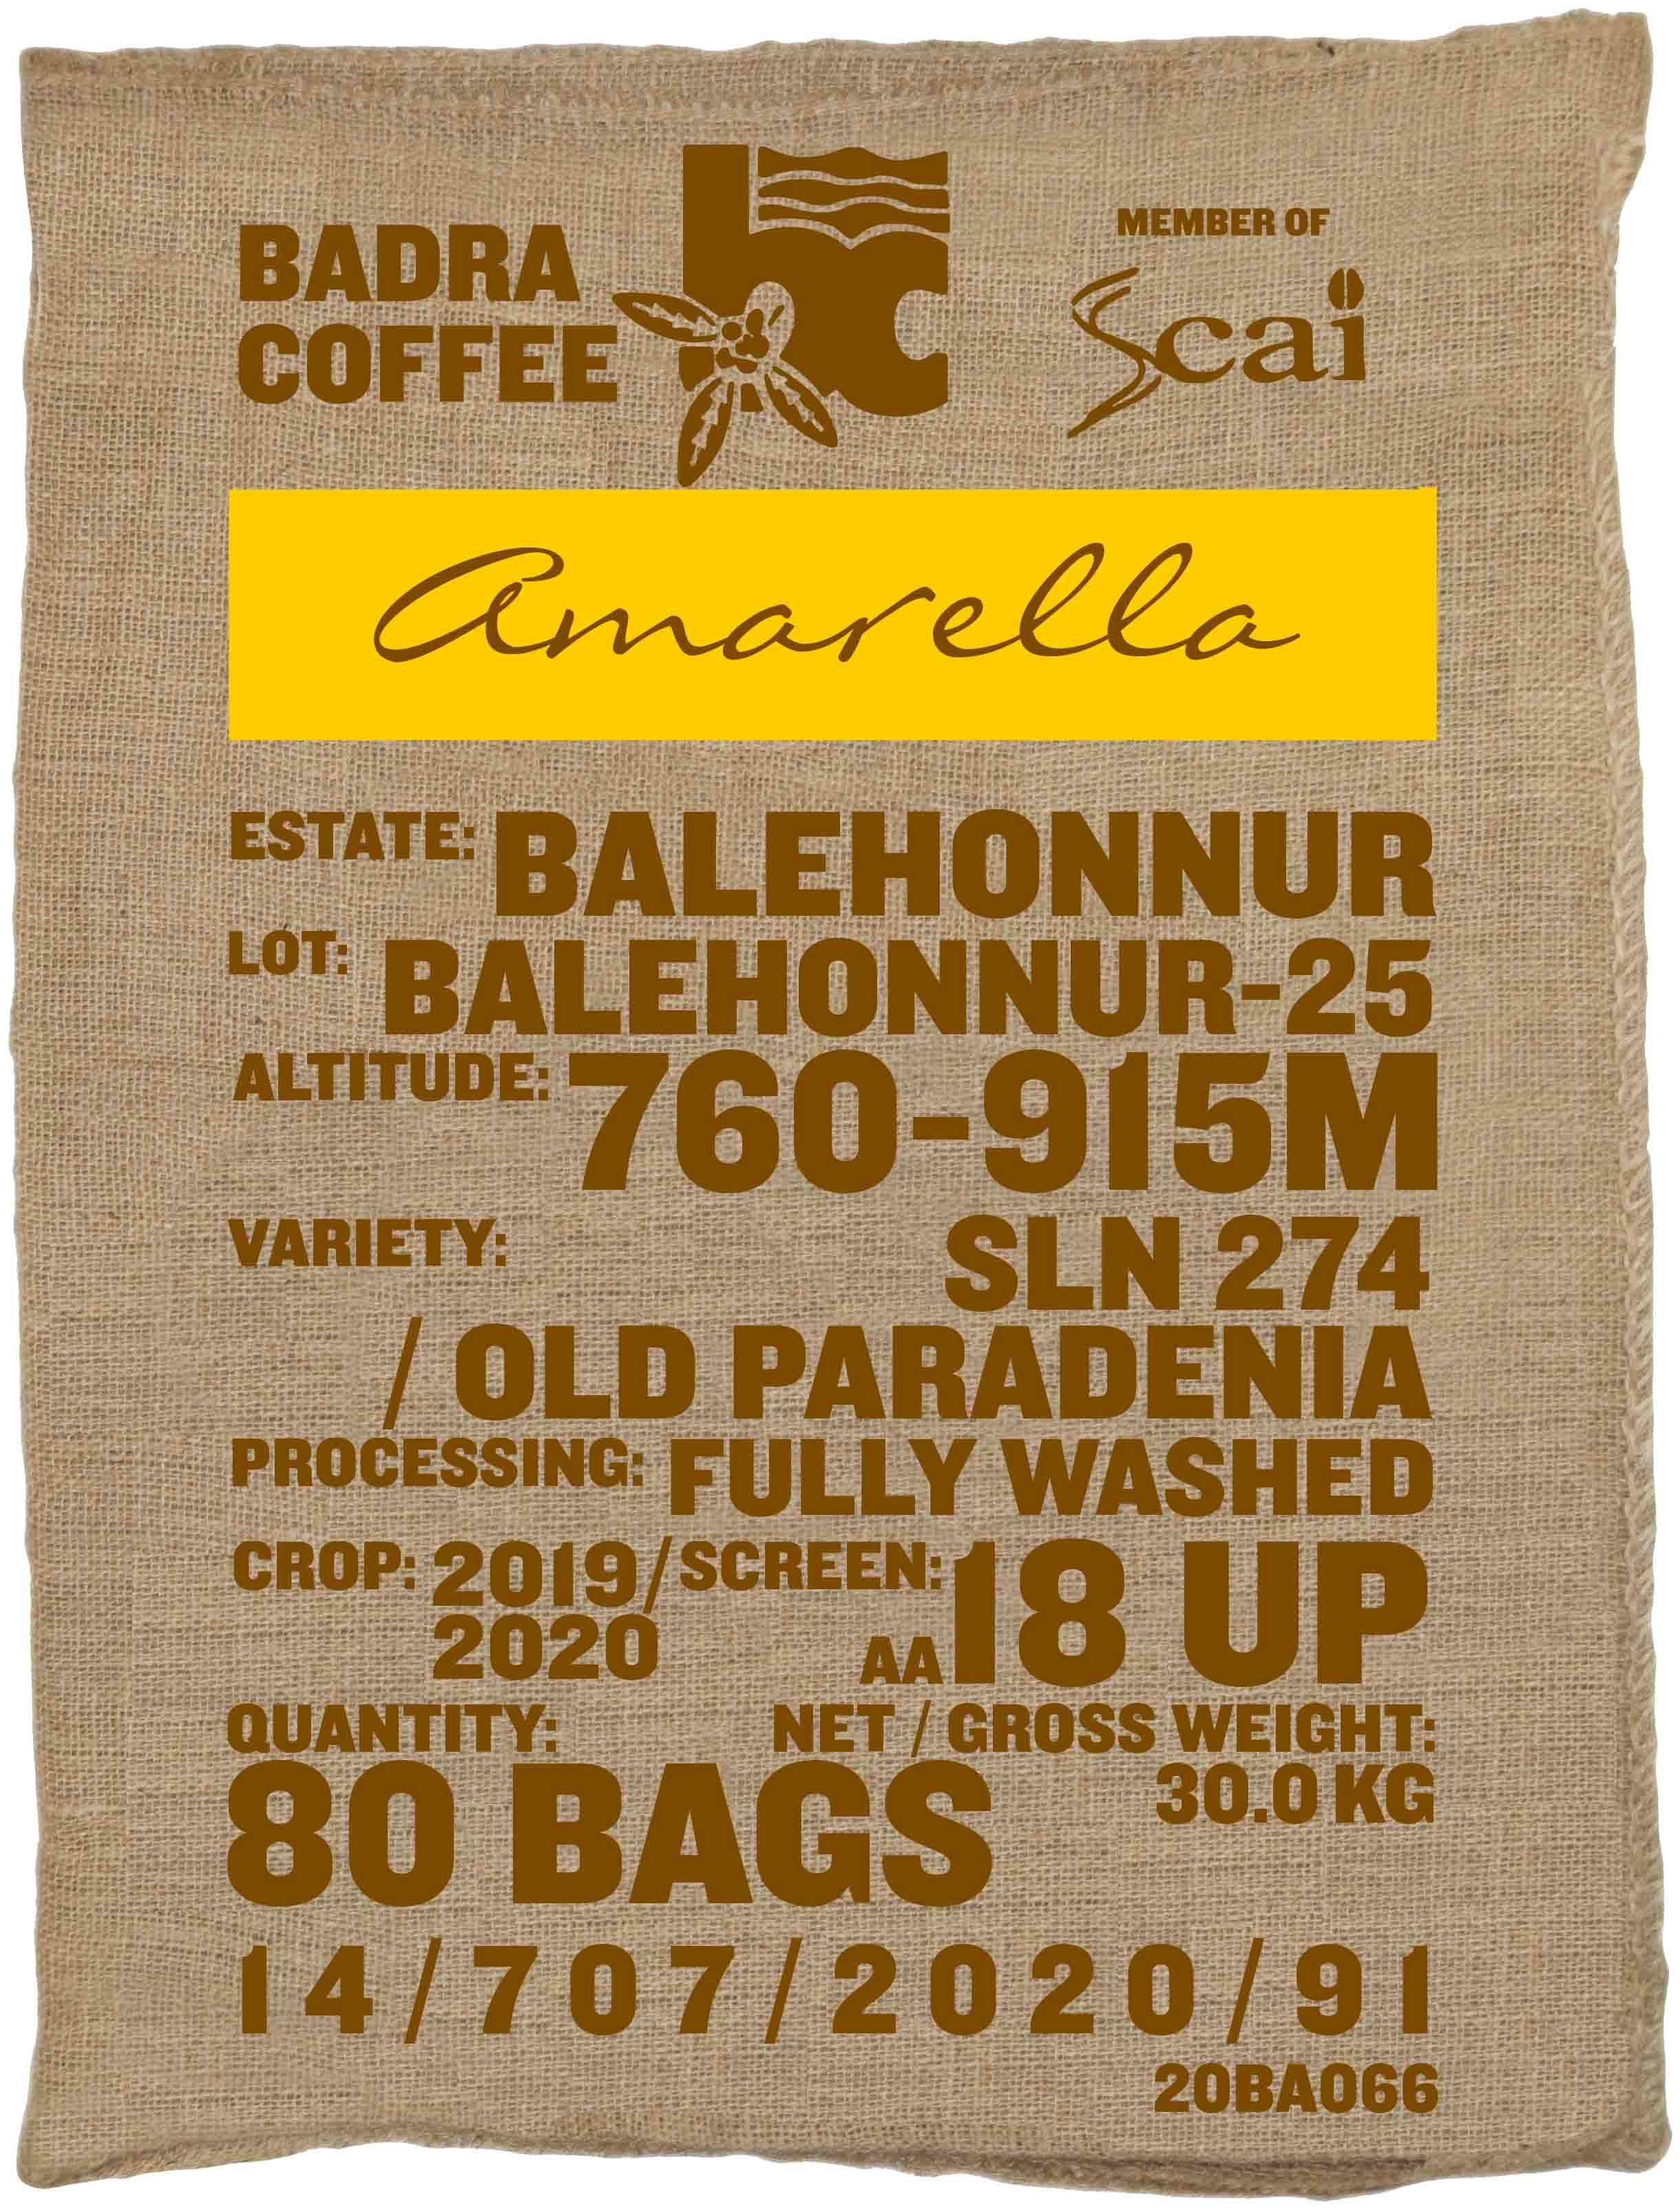 Ein Rohkaffeesack amarella Parzellenkaffee Varietät SLN 274/Old Paradenia. Badra Estates Lot Balehonnur 25.